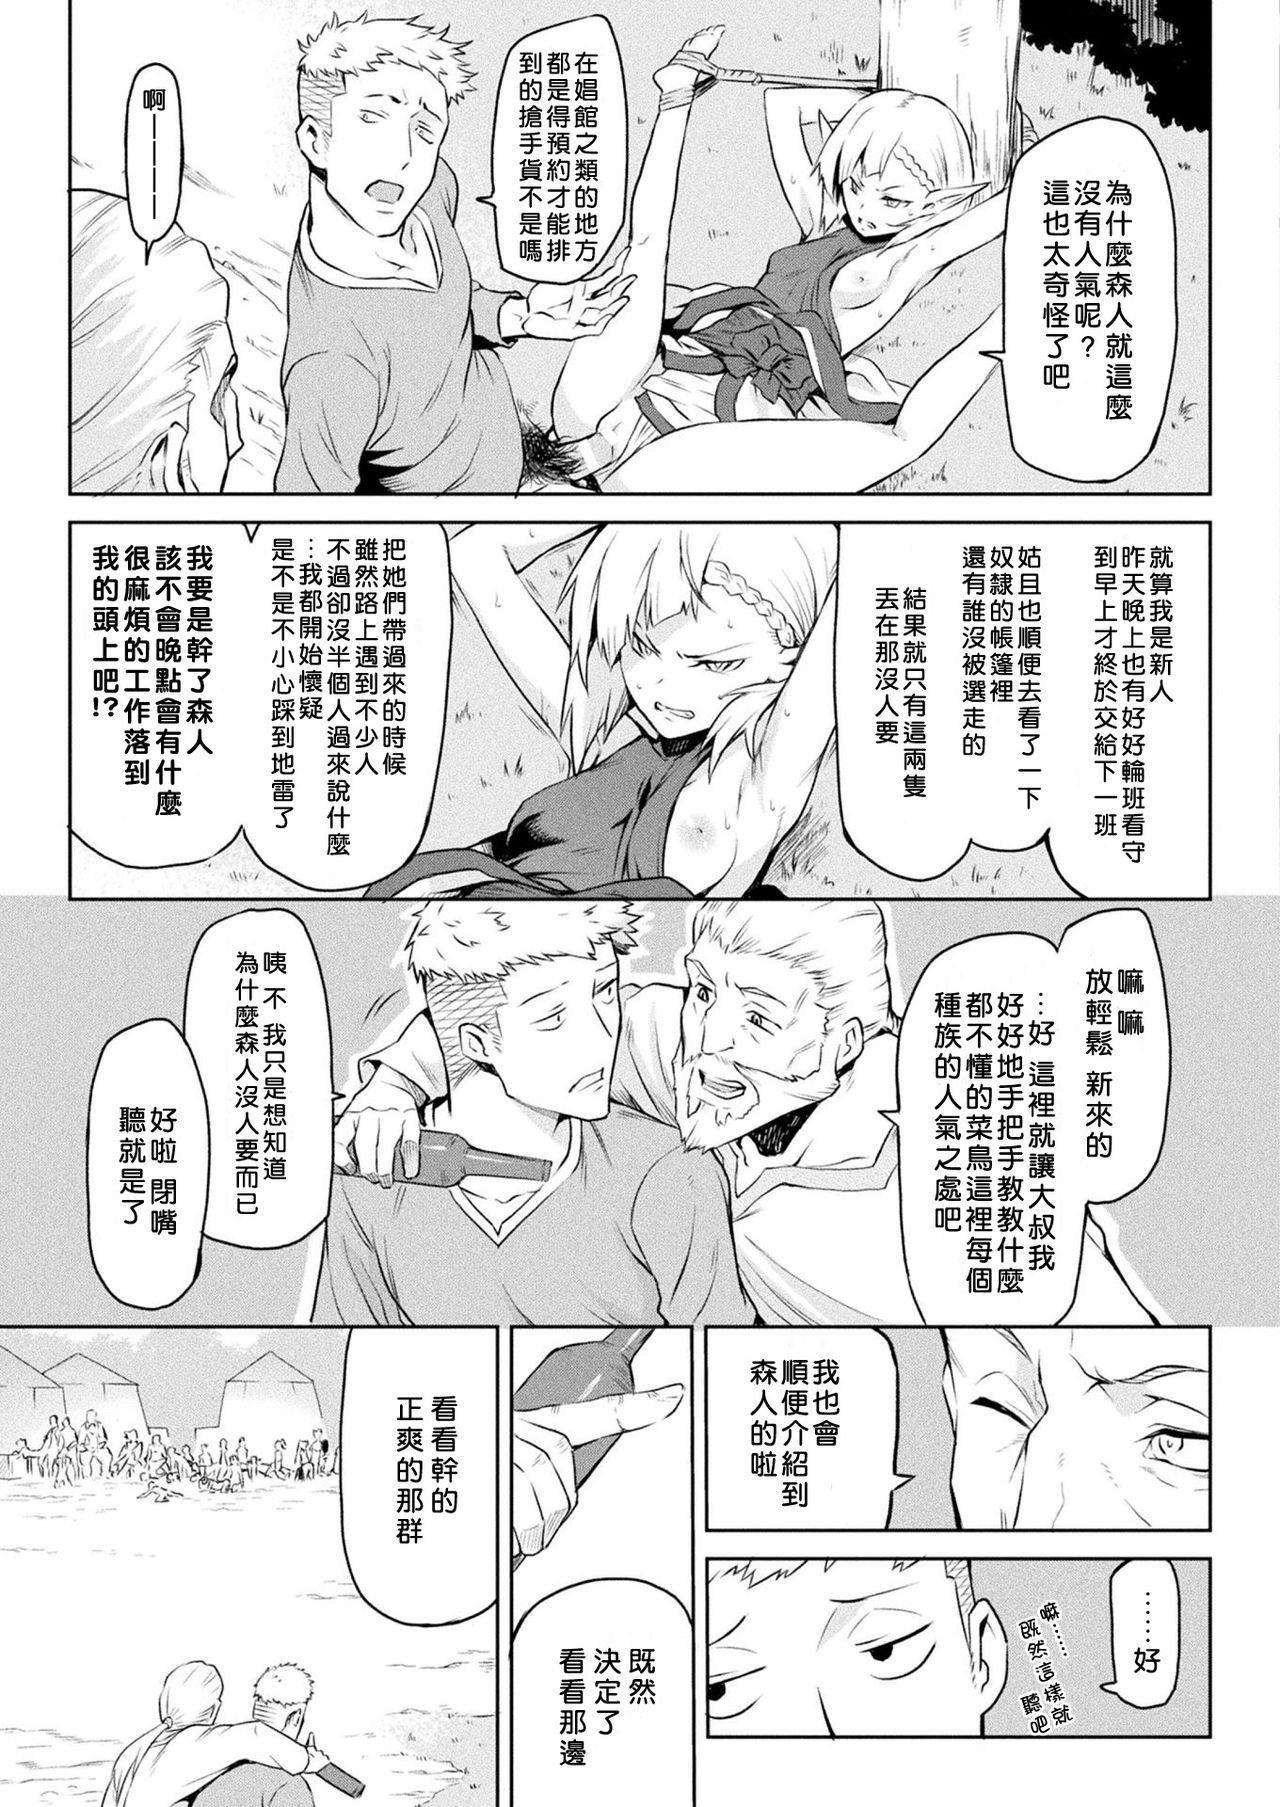 Kisei-jyu 36